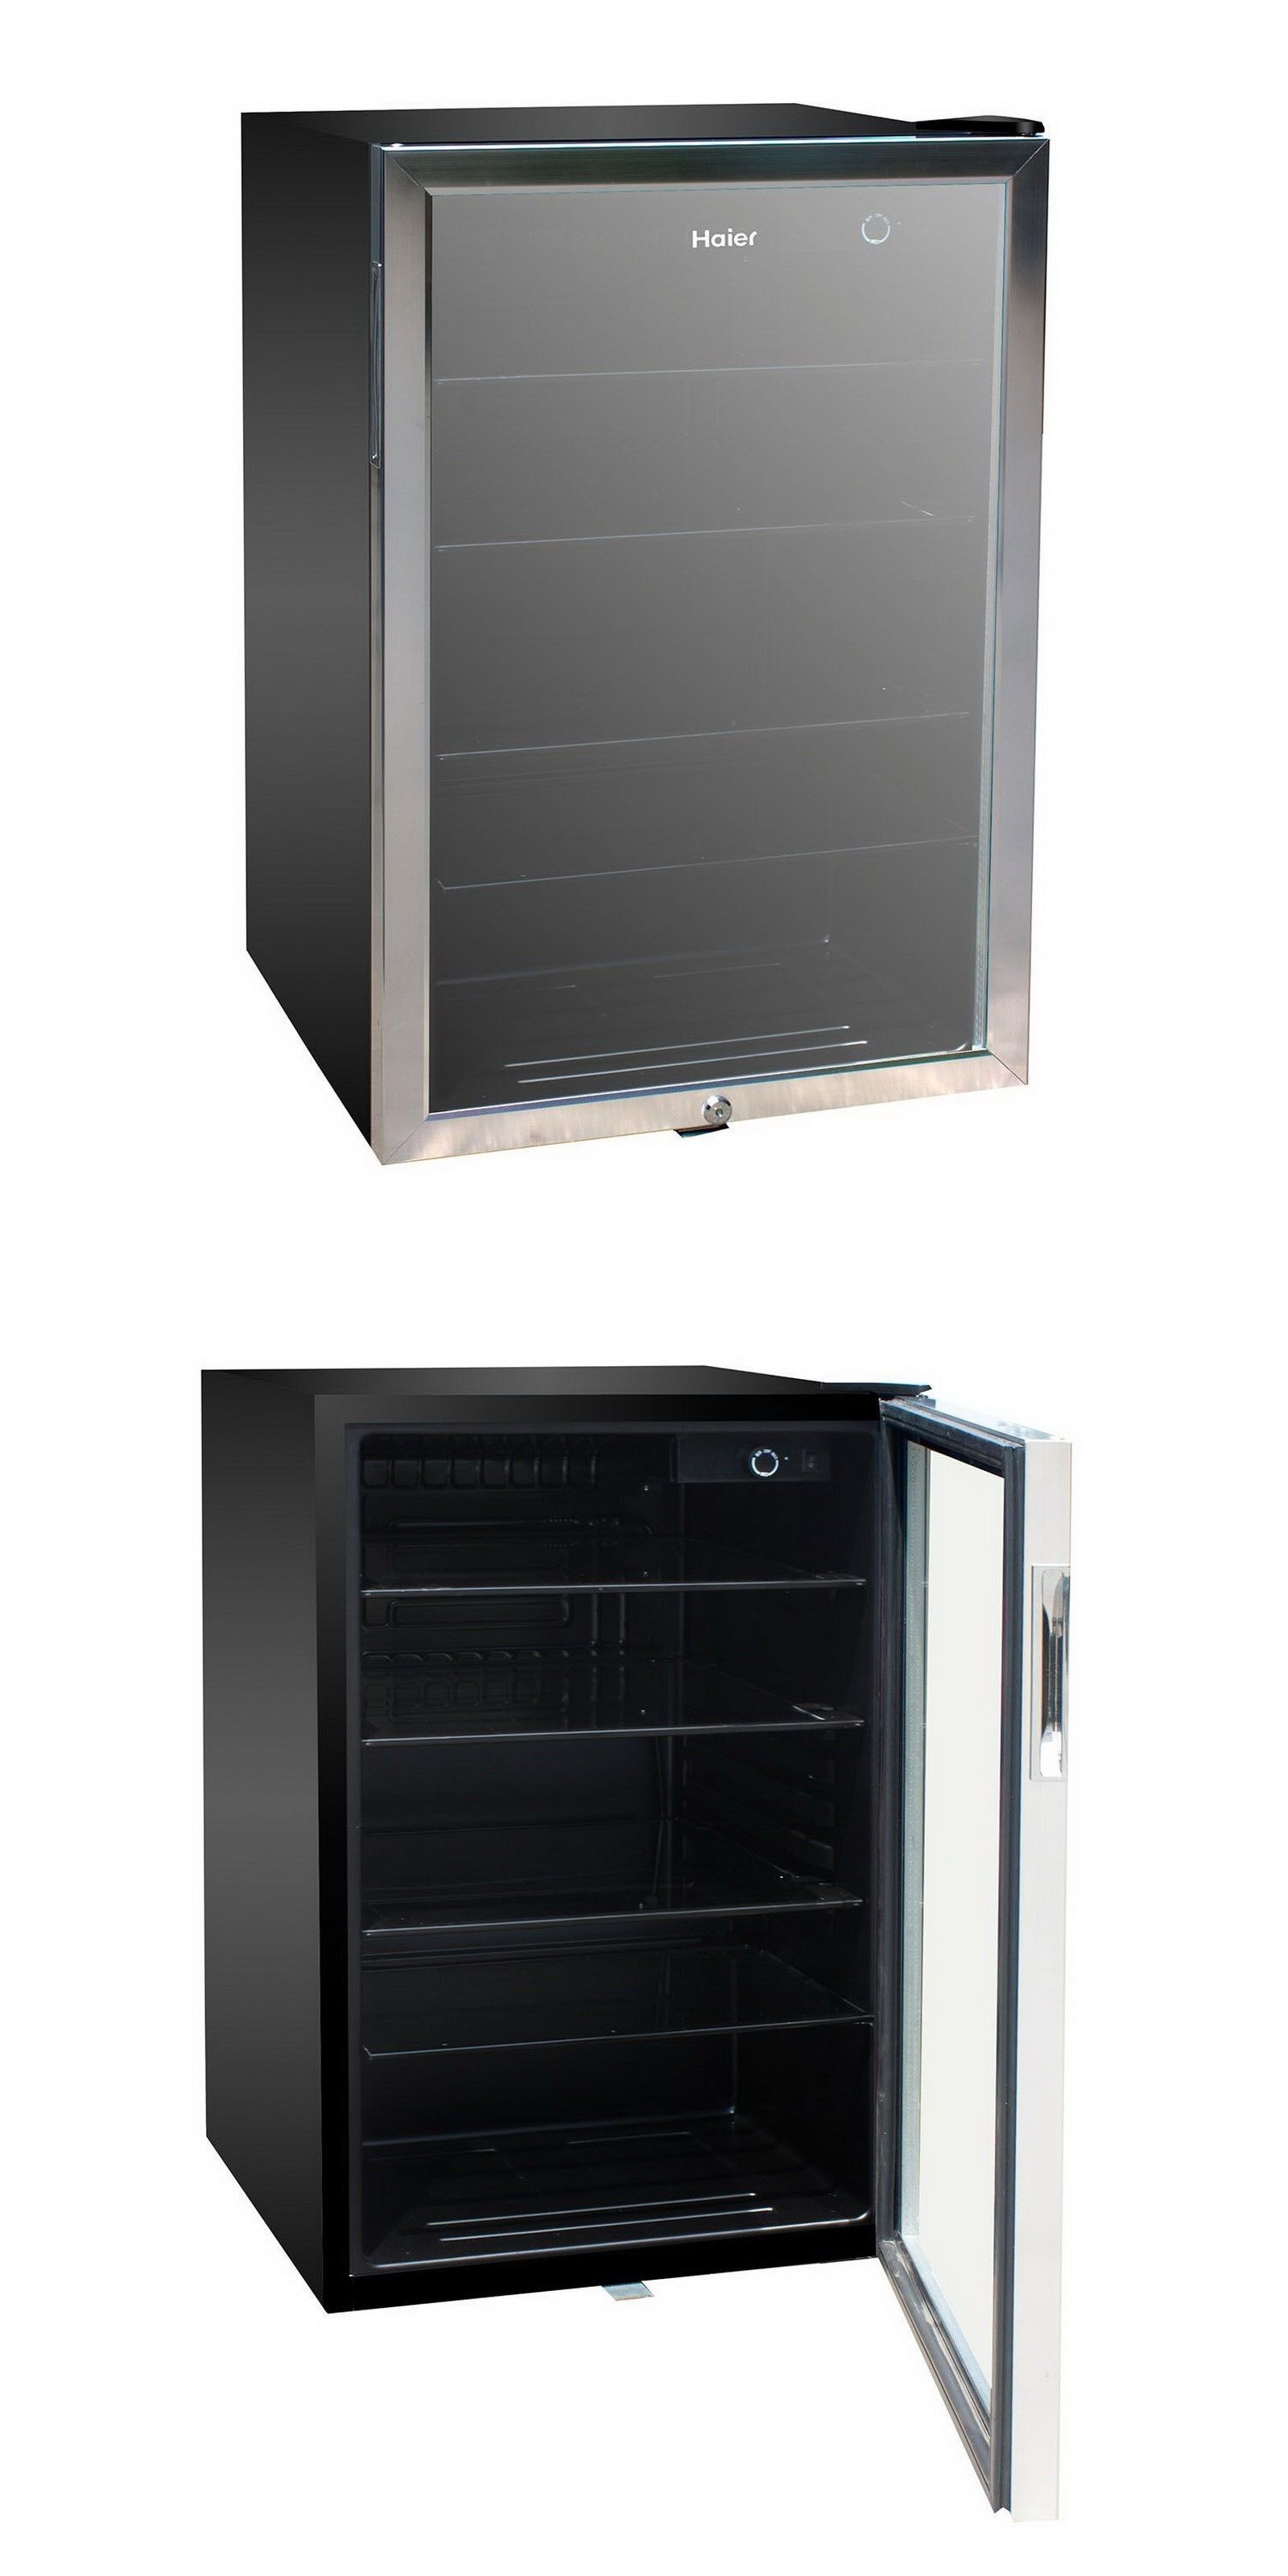 Exceptionnel Mini Fridges 71262: Haier 150 Can Beverage Mini Fridge Refrigerator Glass  Door Cooler  U003e BUY IT NOW ONLY: $249.9 On EBay!